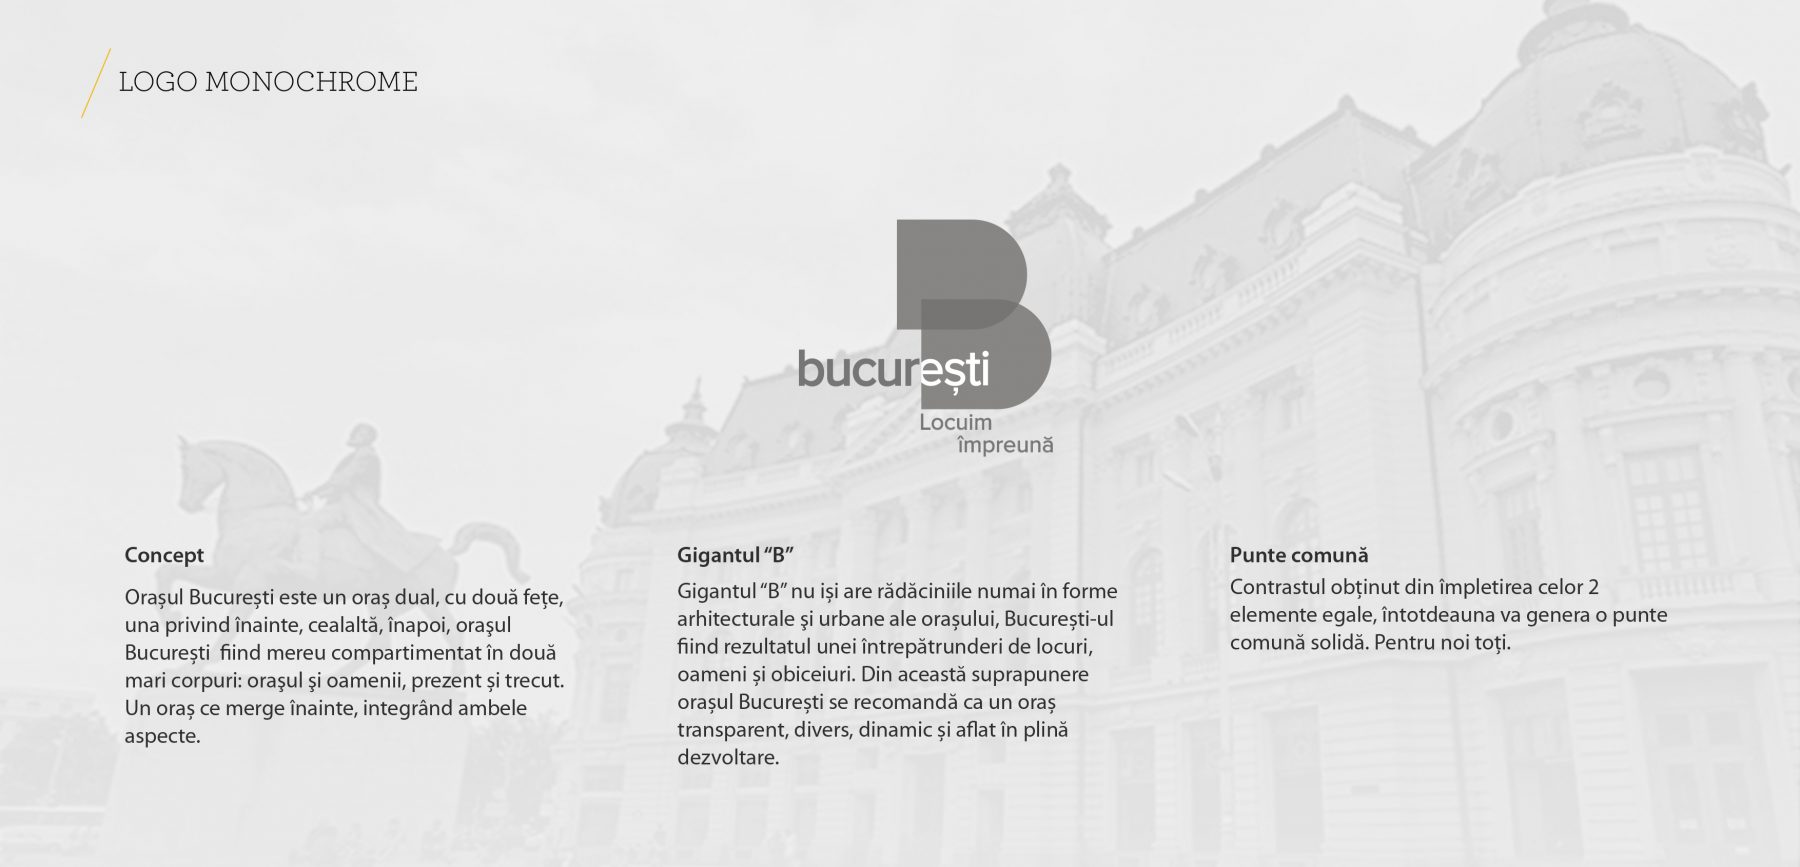 Gabriela Firea, Logo, Bucuresti, Bucharest 2017, public contest, Bogdan Naumovici, Costin Oane, brand city, BroHouse, competition, design, passion, branding, identity, value, Romania, work, design, Horia Oane, Giant B